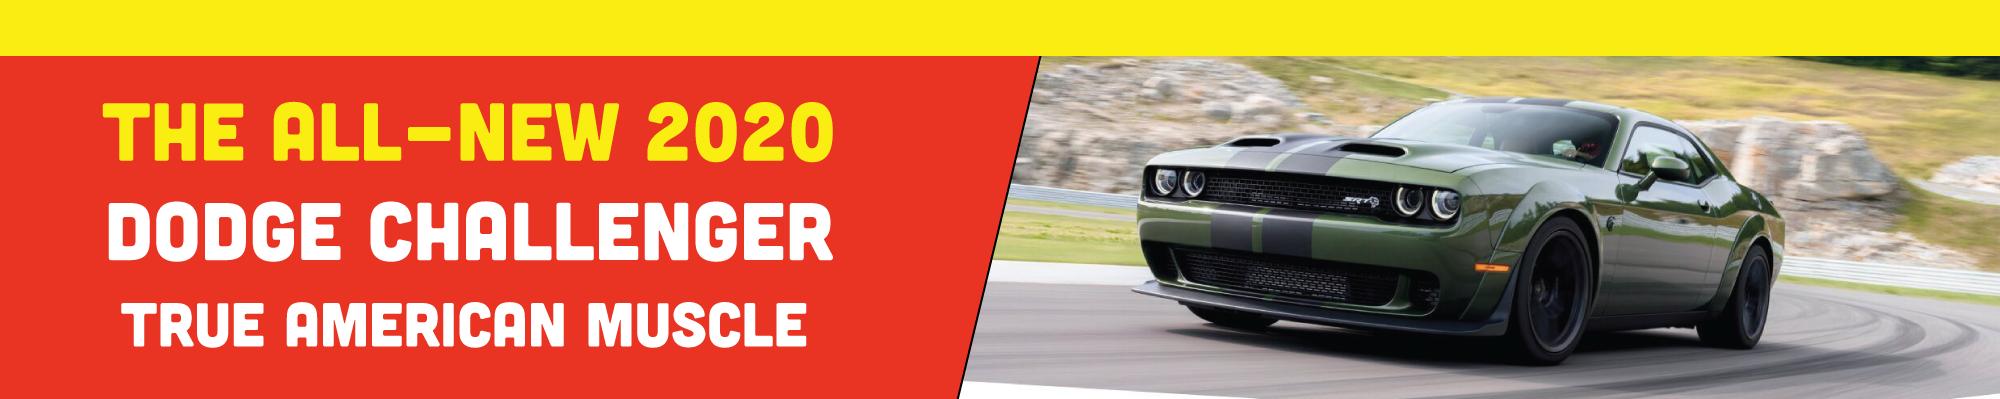 2020 dodge challenger spokane auto show